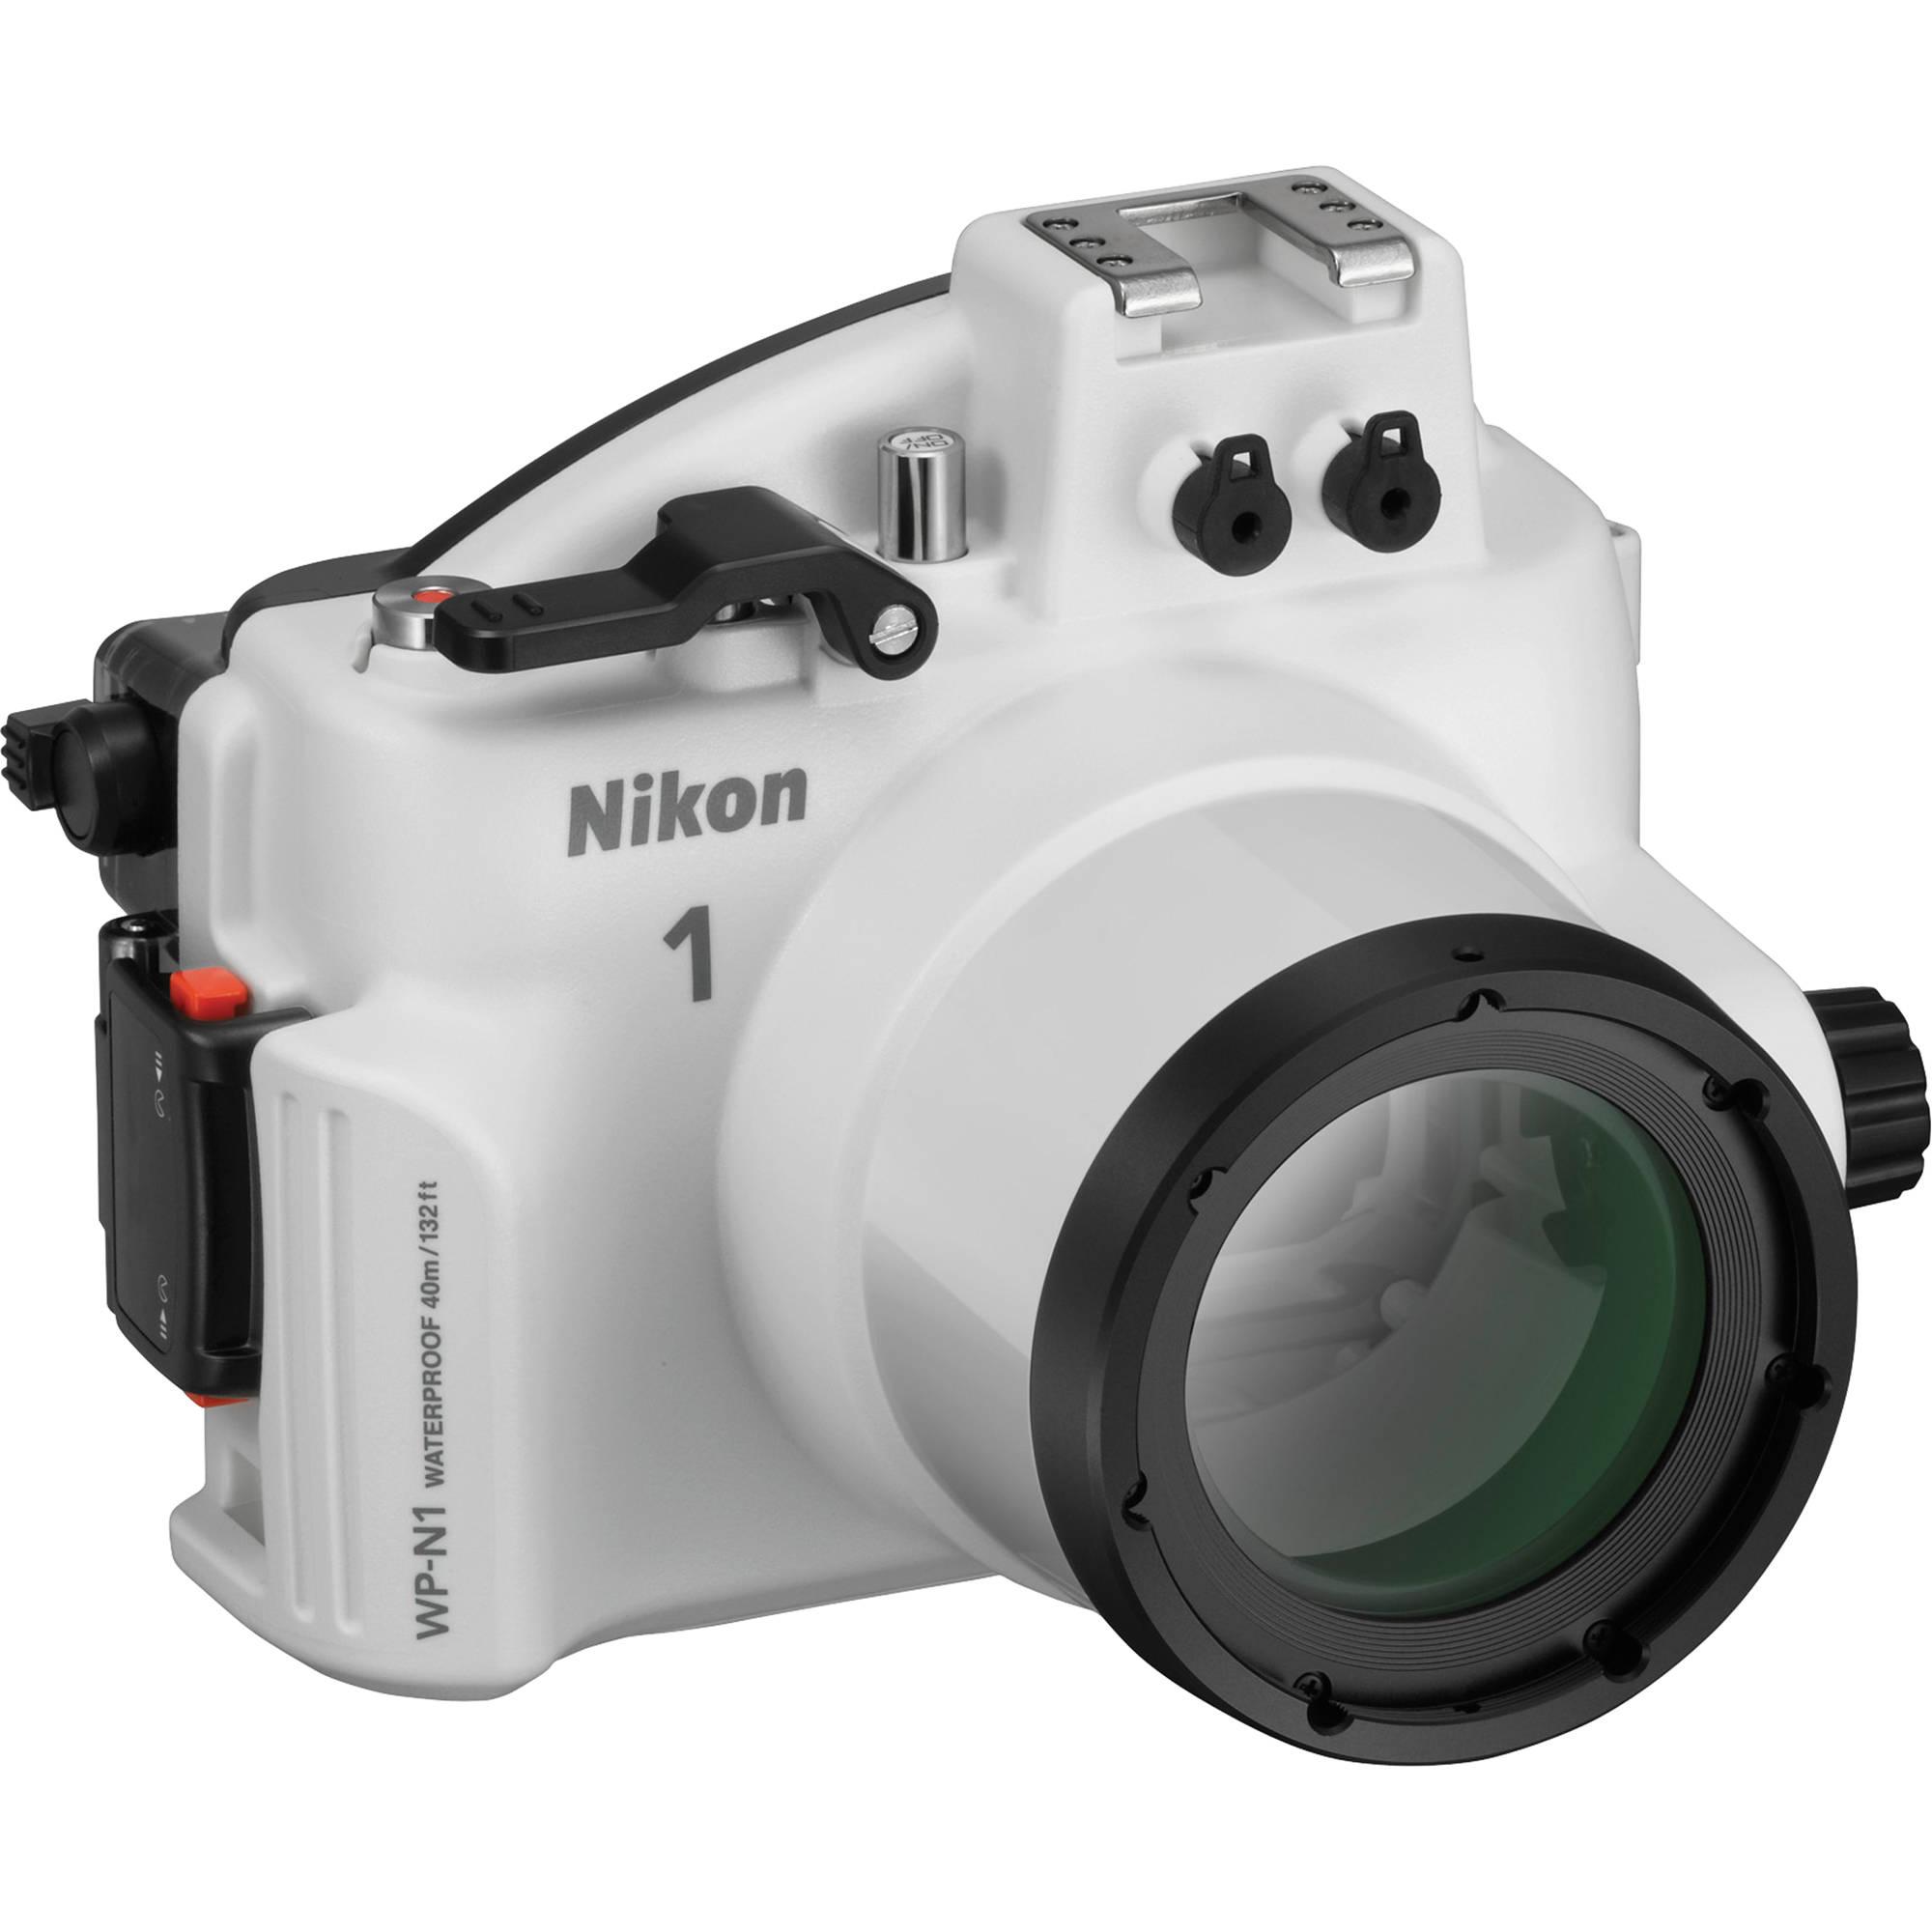 Nikon 1 J1 Camera XP